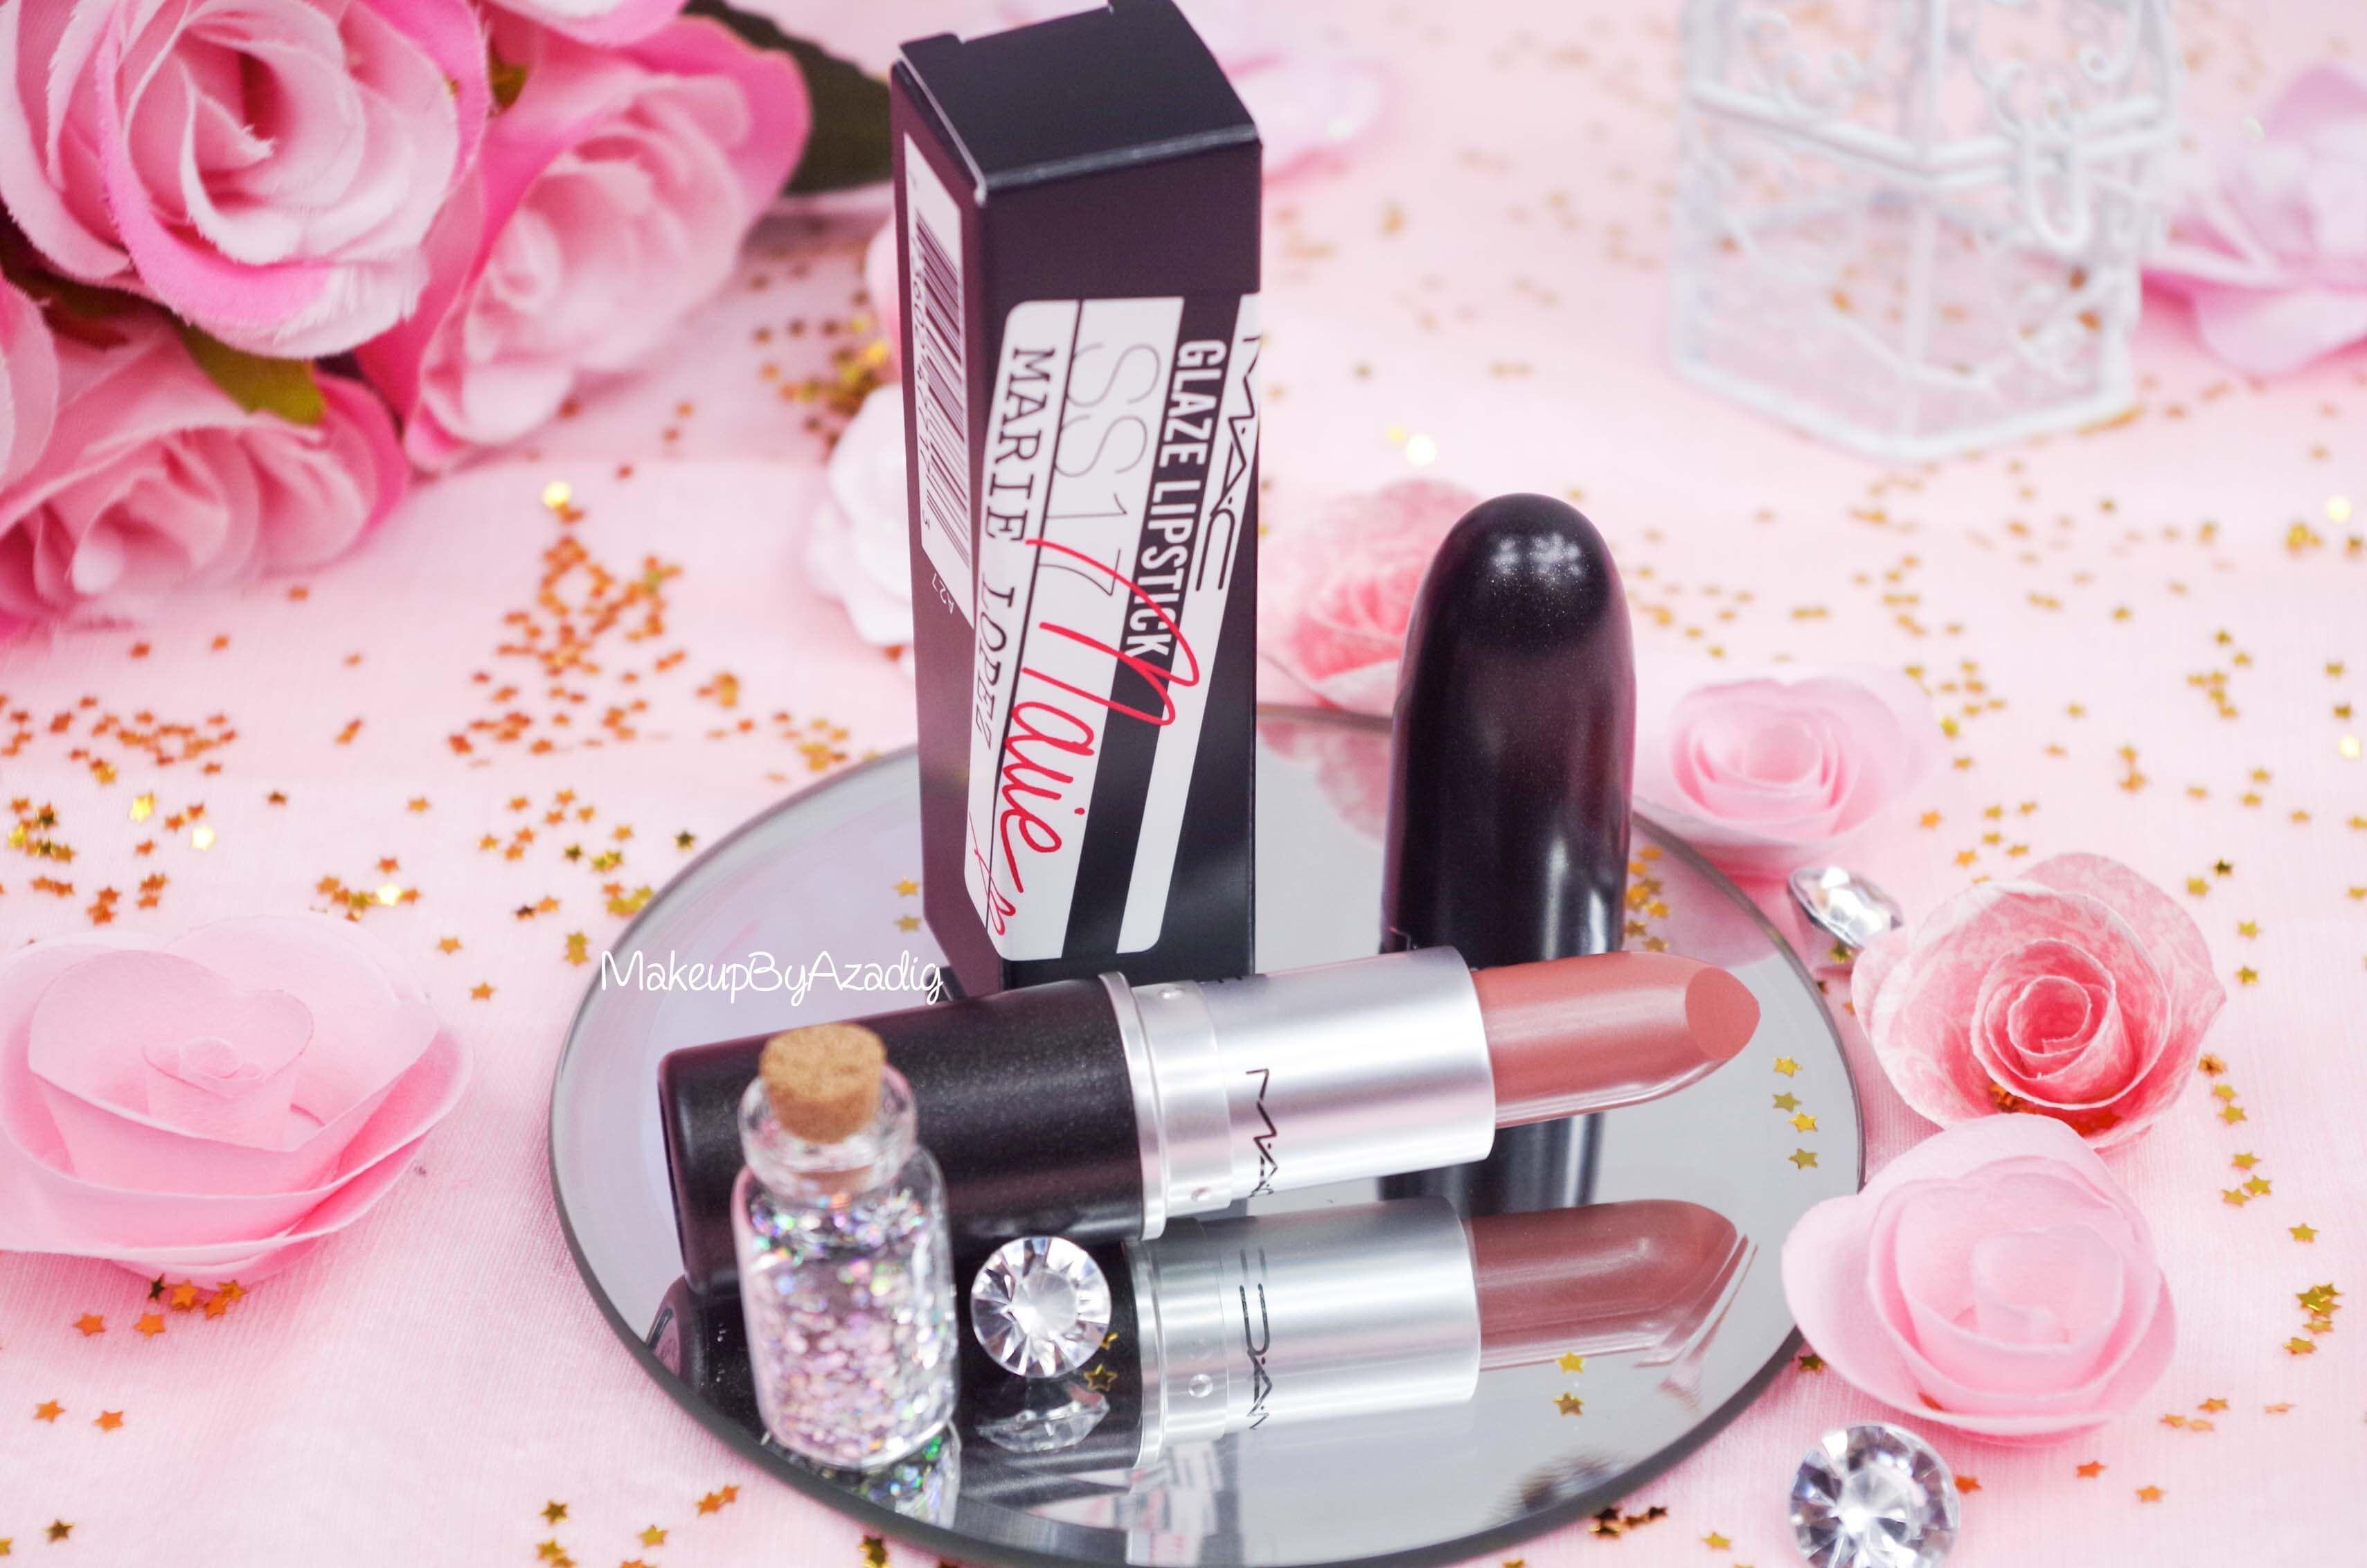 blush-macxmarie-mac-cosmetics-rouge-a-levres-enjoy-phoenix-collaboration-makeupbyazadig-revue-avis-prix-meetup